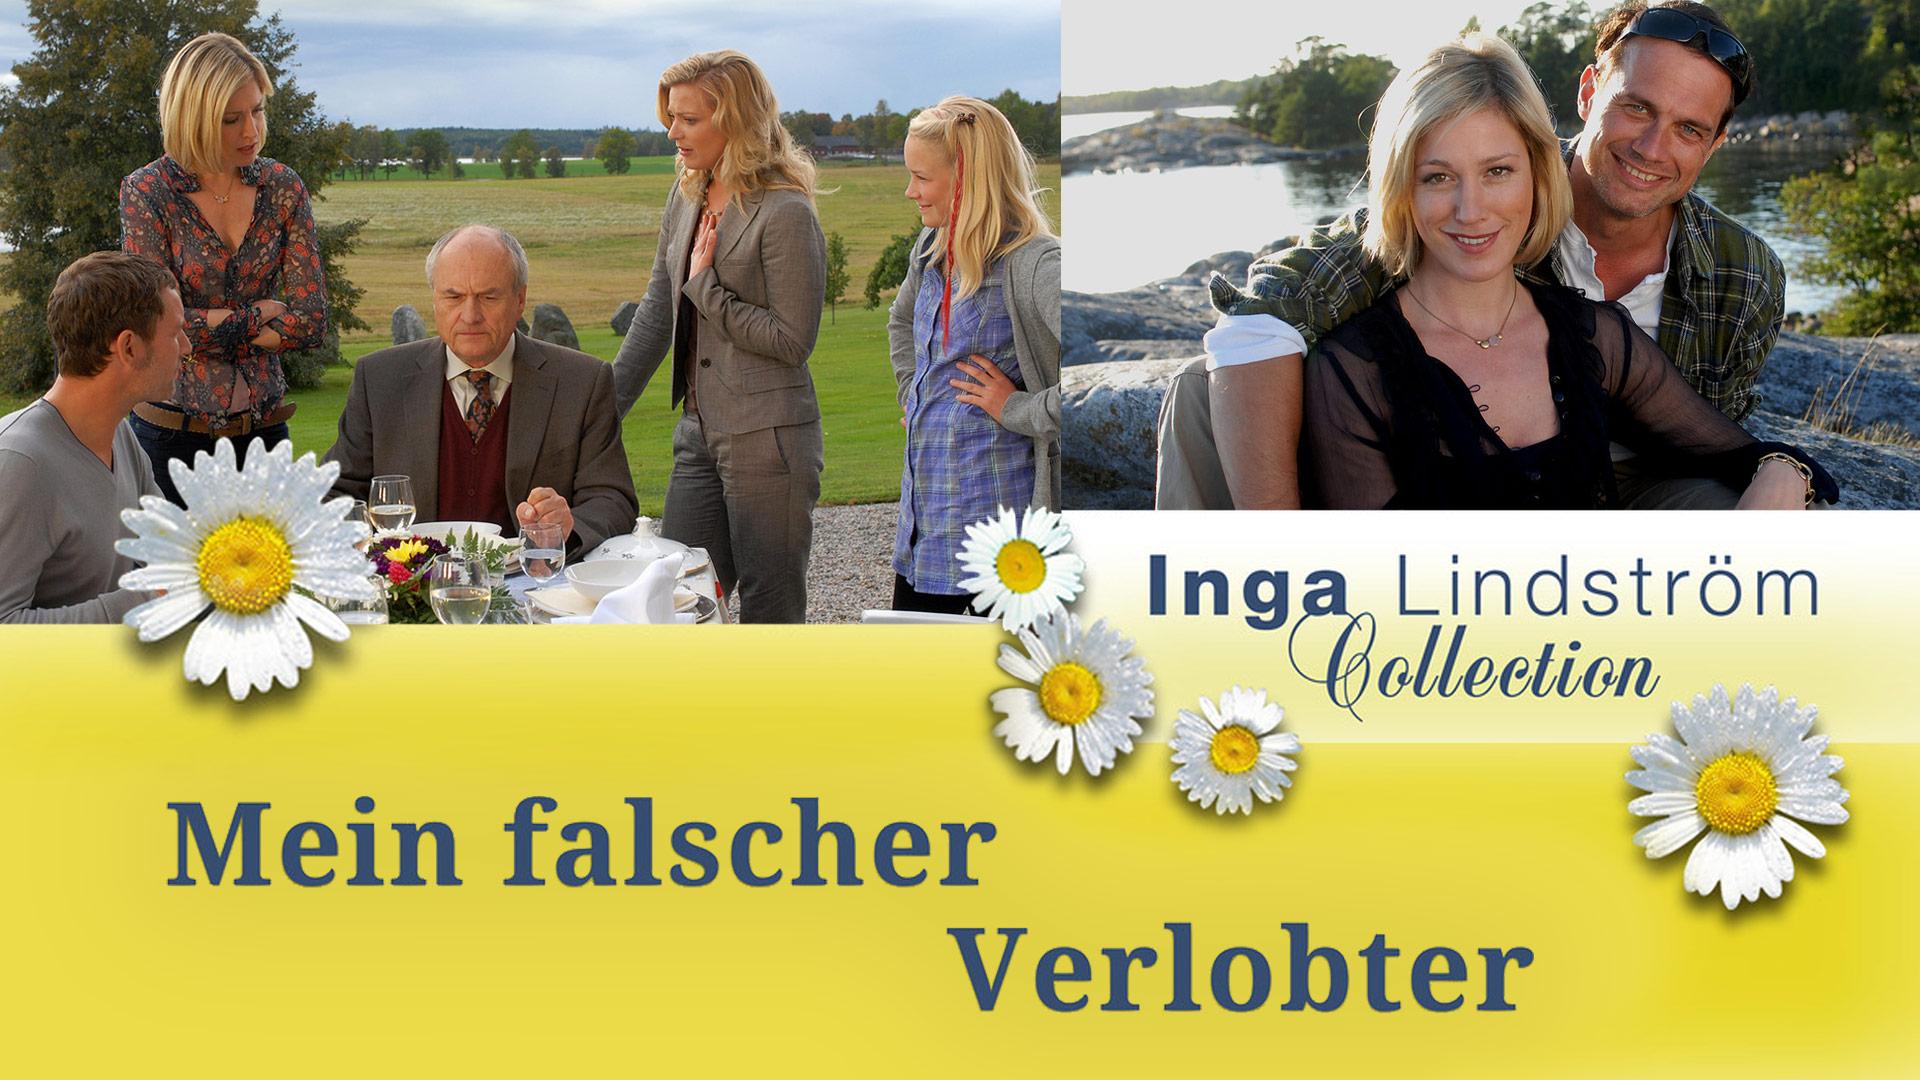 Inga Lindström: Mein falscher Verlobter